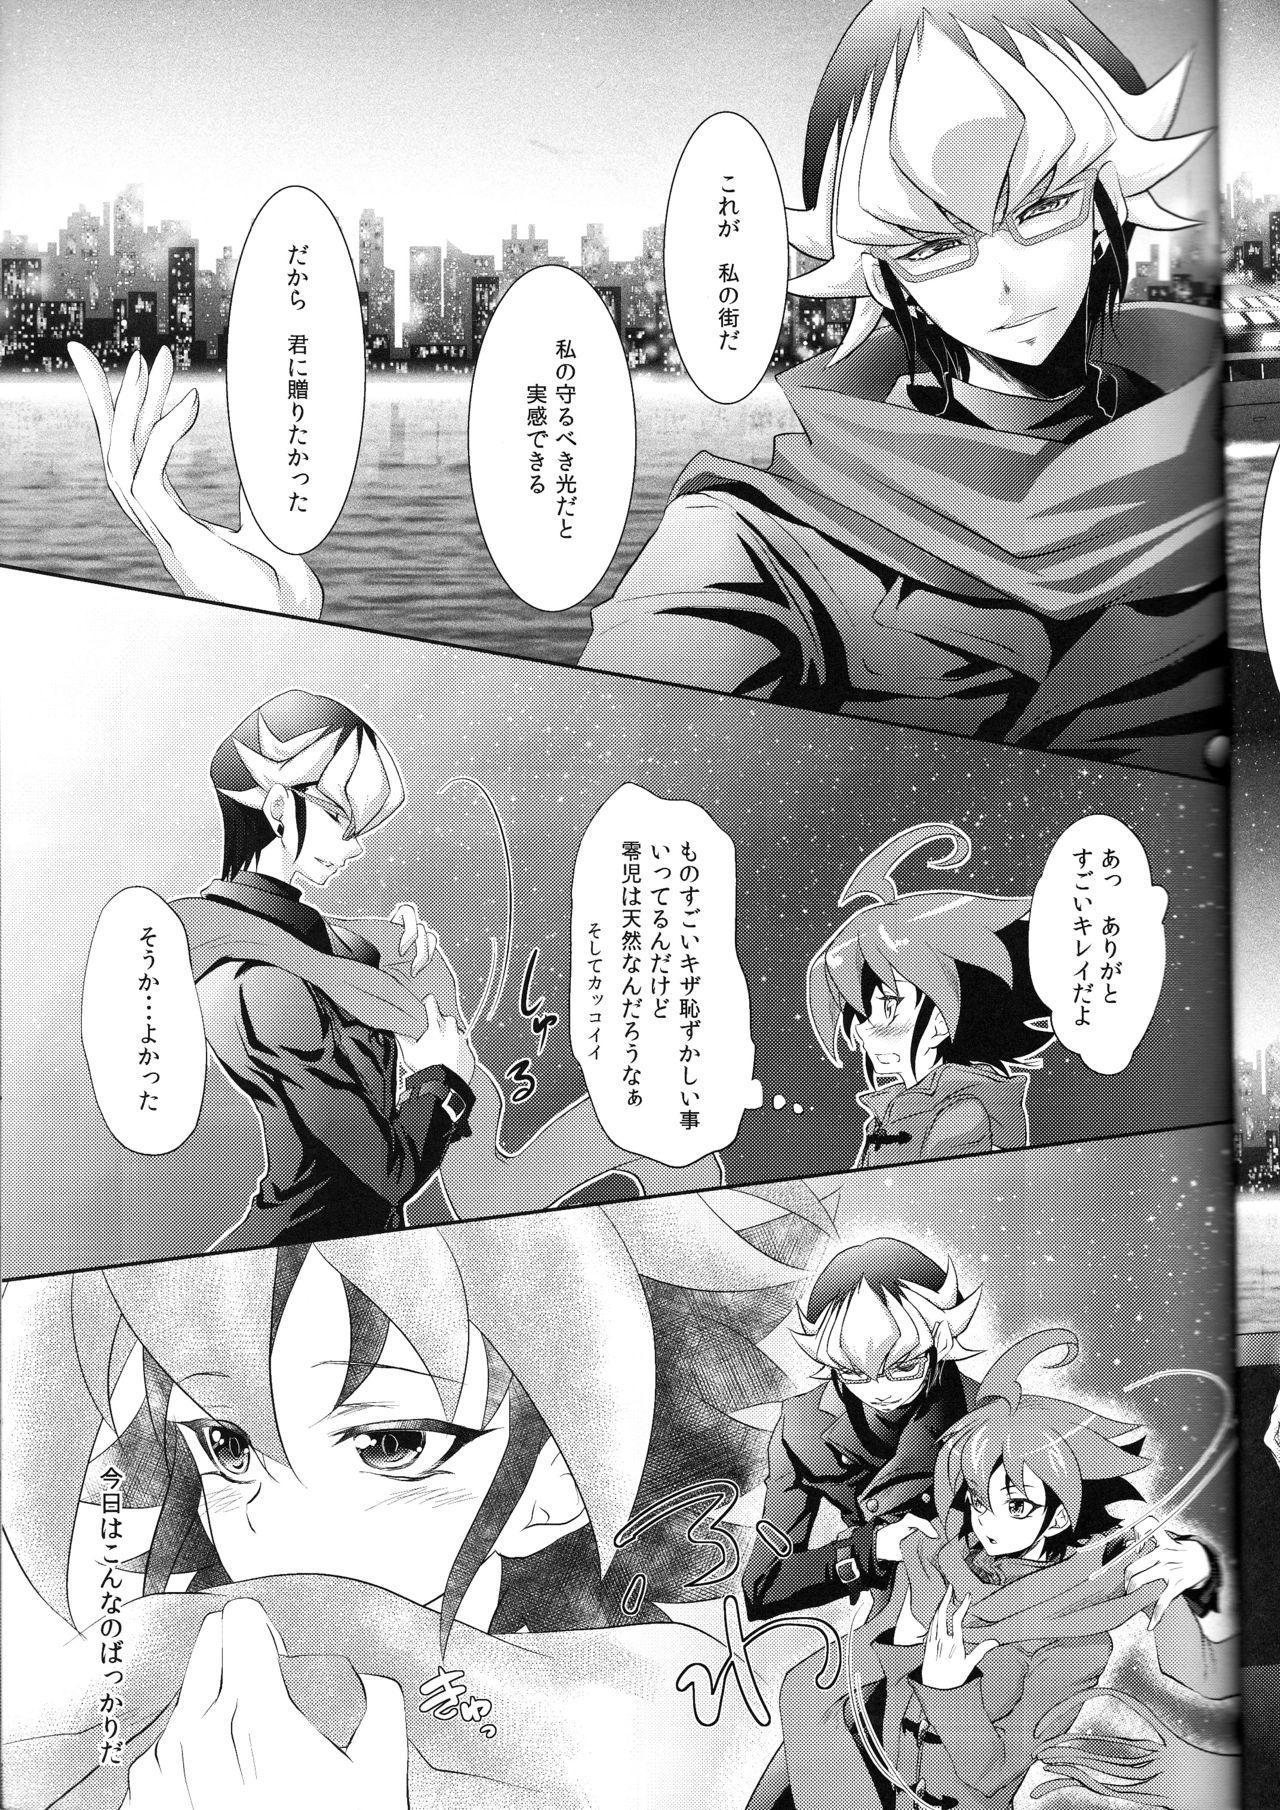 Rune Eyes 8